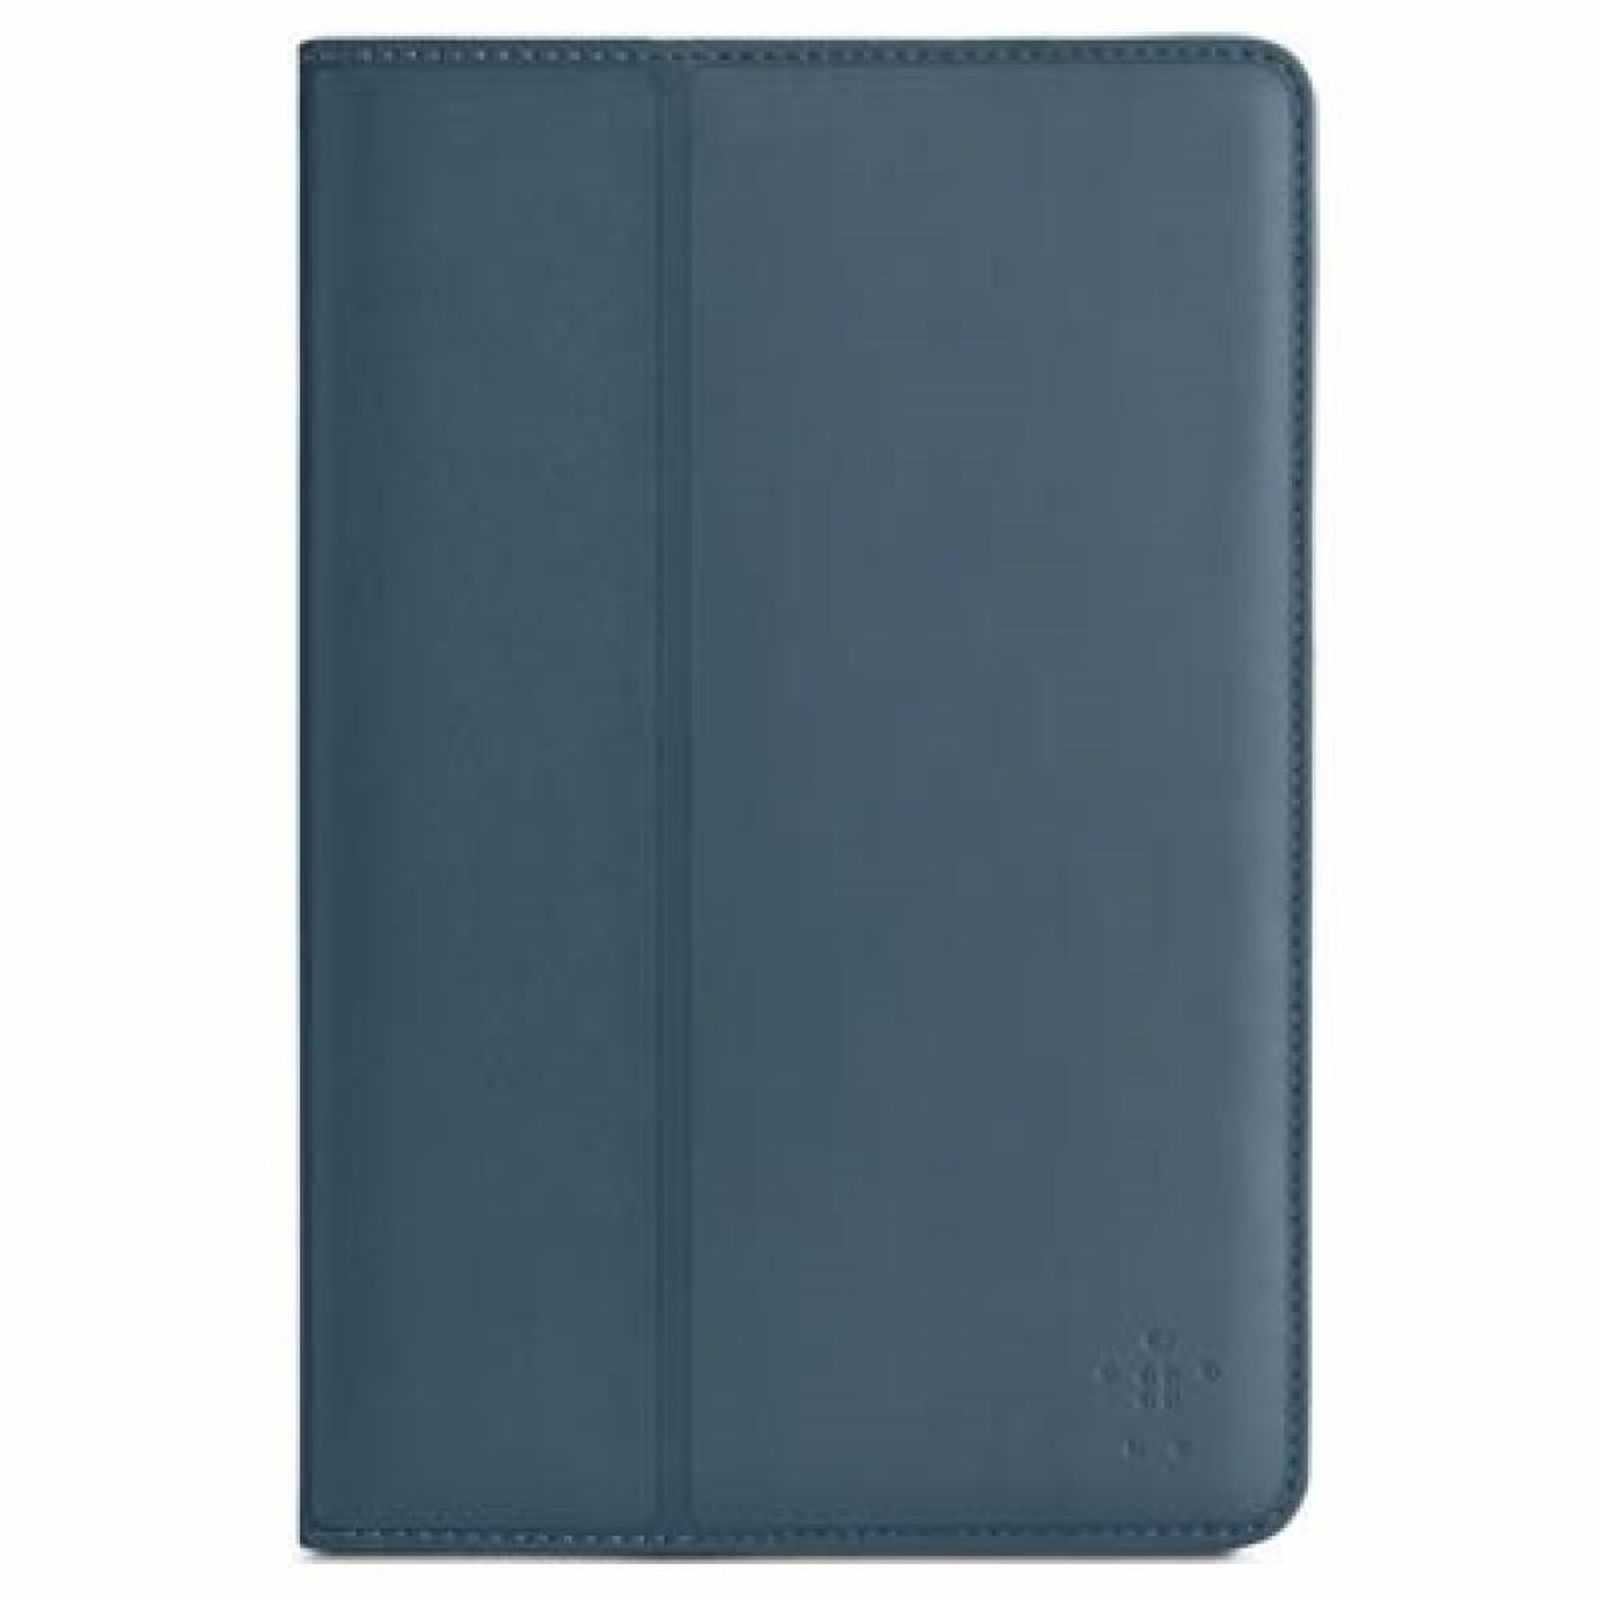 Чехол для планшета Belkin 10.1 GalaxyTab3 FormFit Stand (F7P138vfC01)